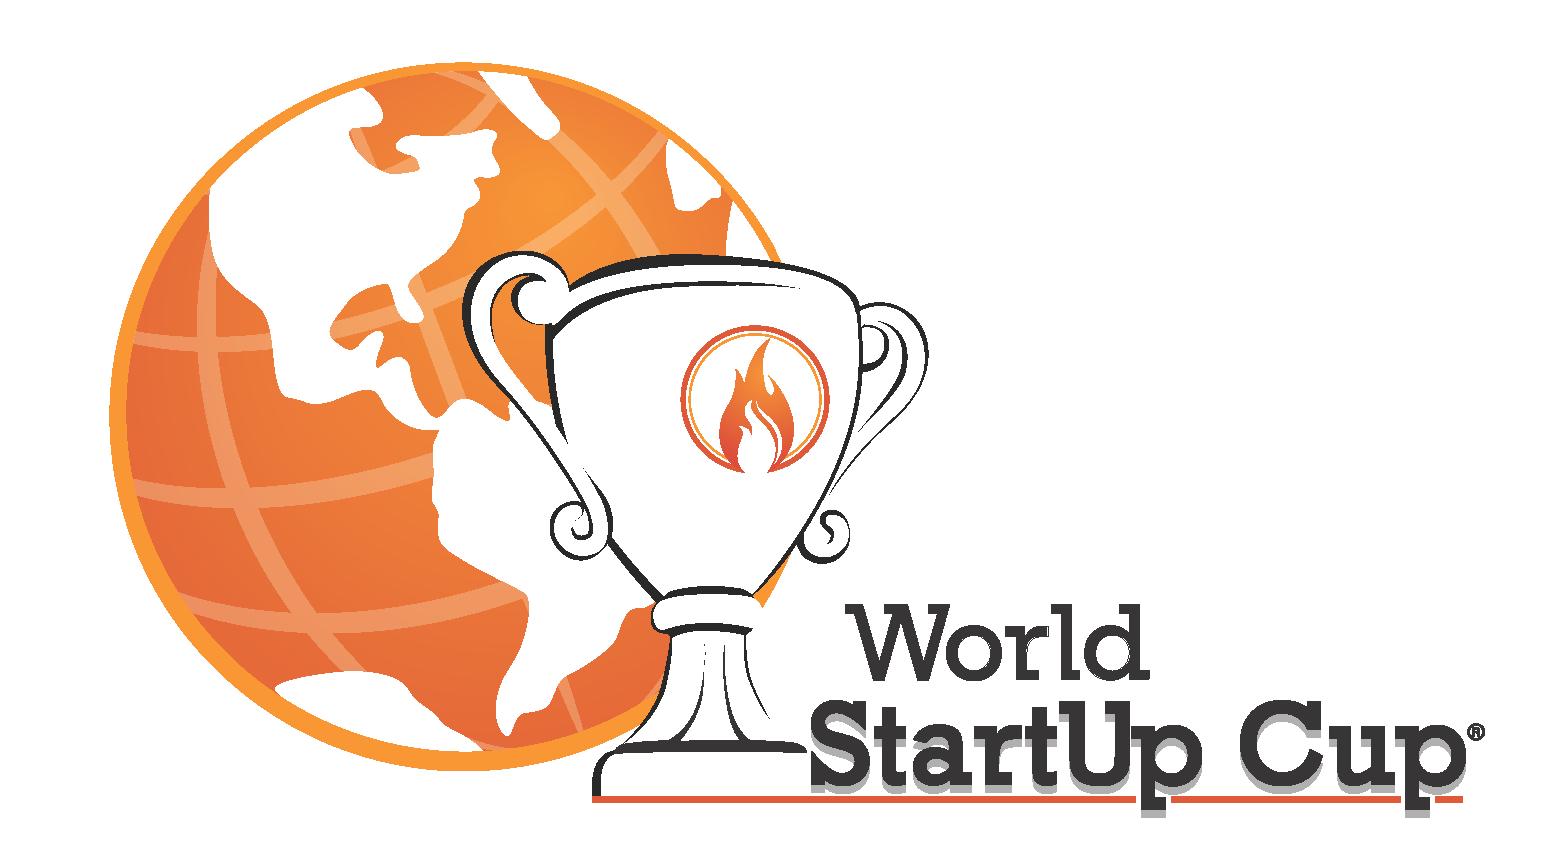 Armenia StartUp Cup 2015 հաղթող թիմ ՝ HY Pictures-ը, կներկայացնի Հայաստանը  World StartUp Cup-ում